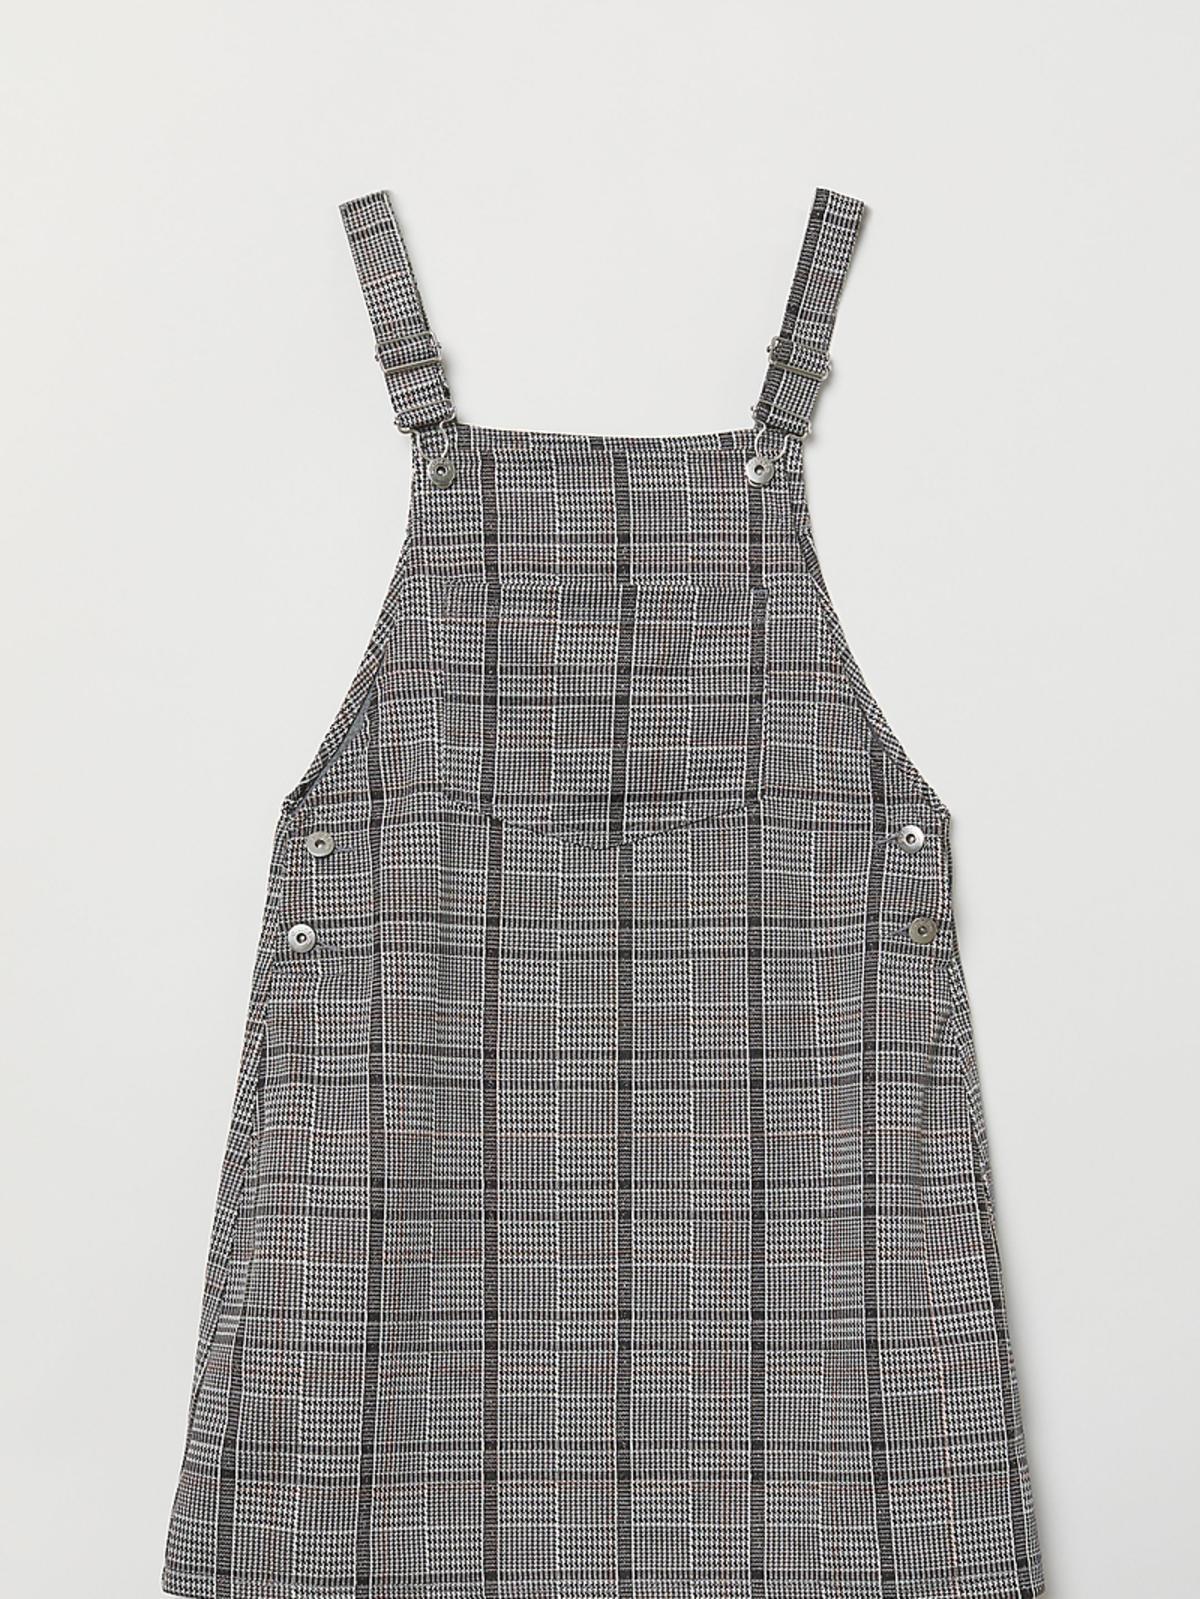 H&M, 159,90 zł